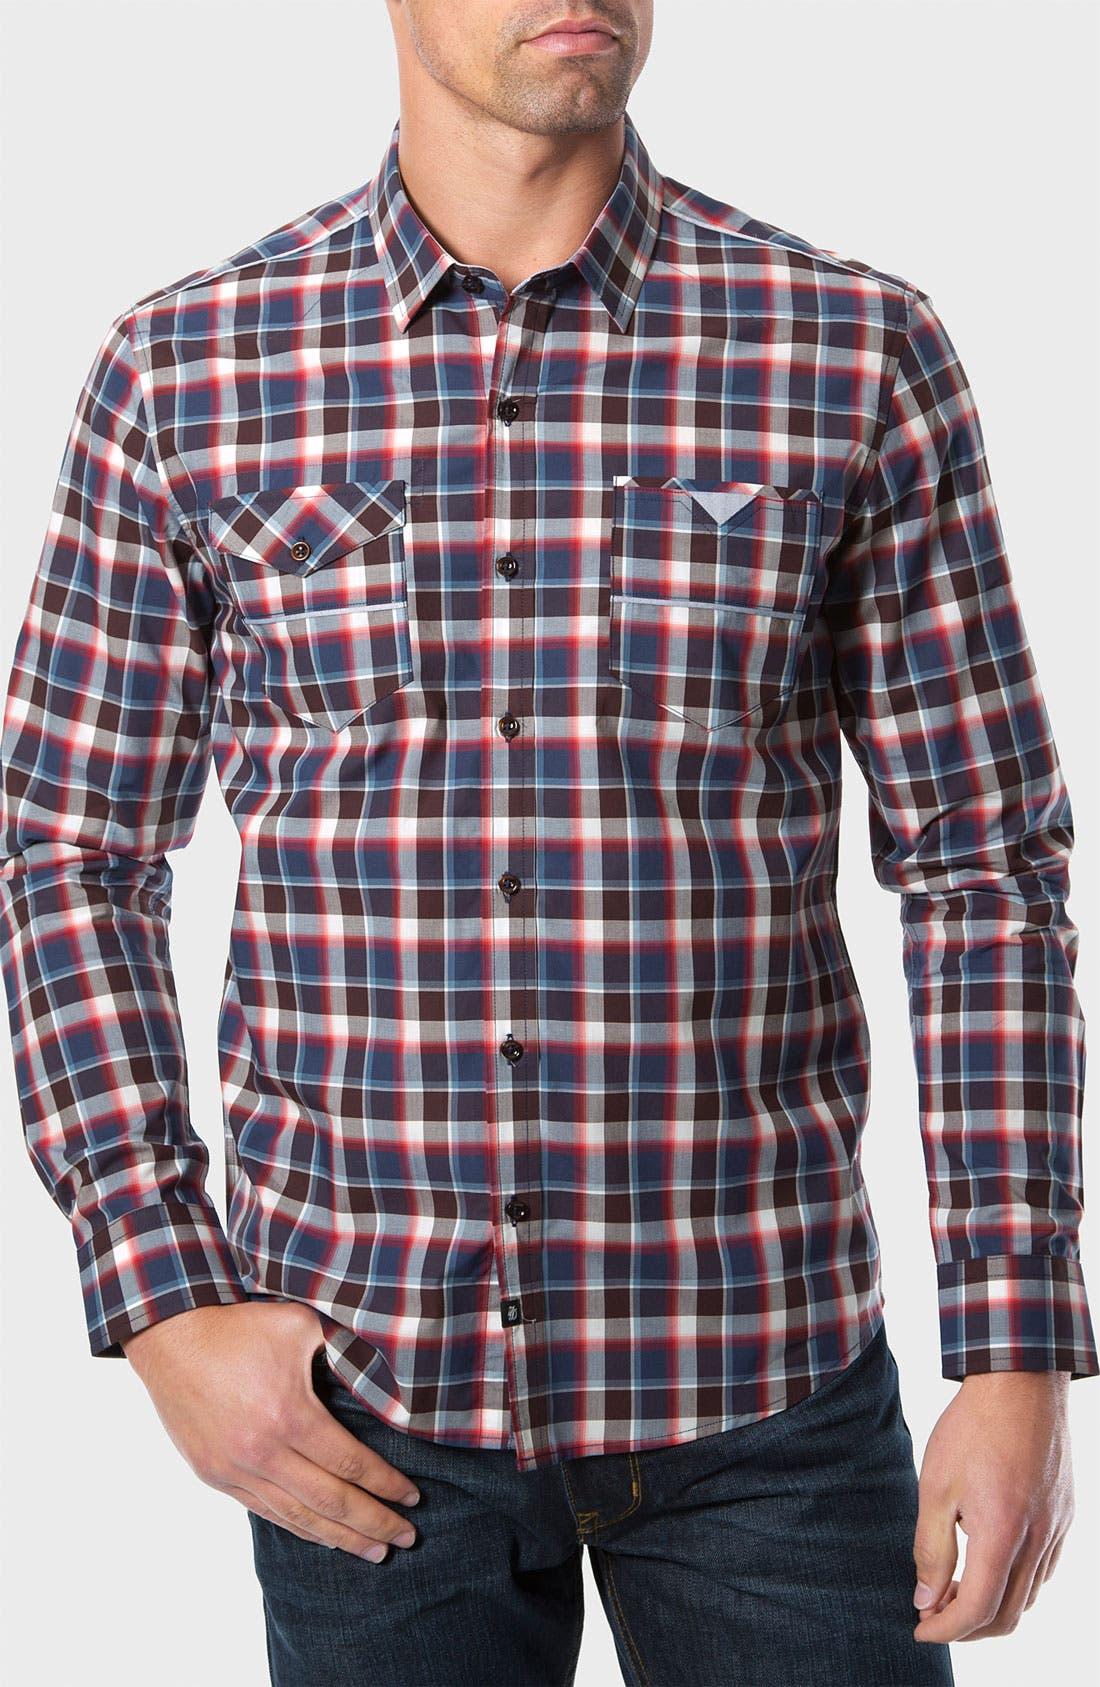 Main Image - 7 Diamonds 'The Ride' Check Trim Fit Cotton Sport Shirt